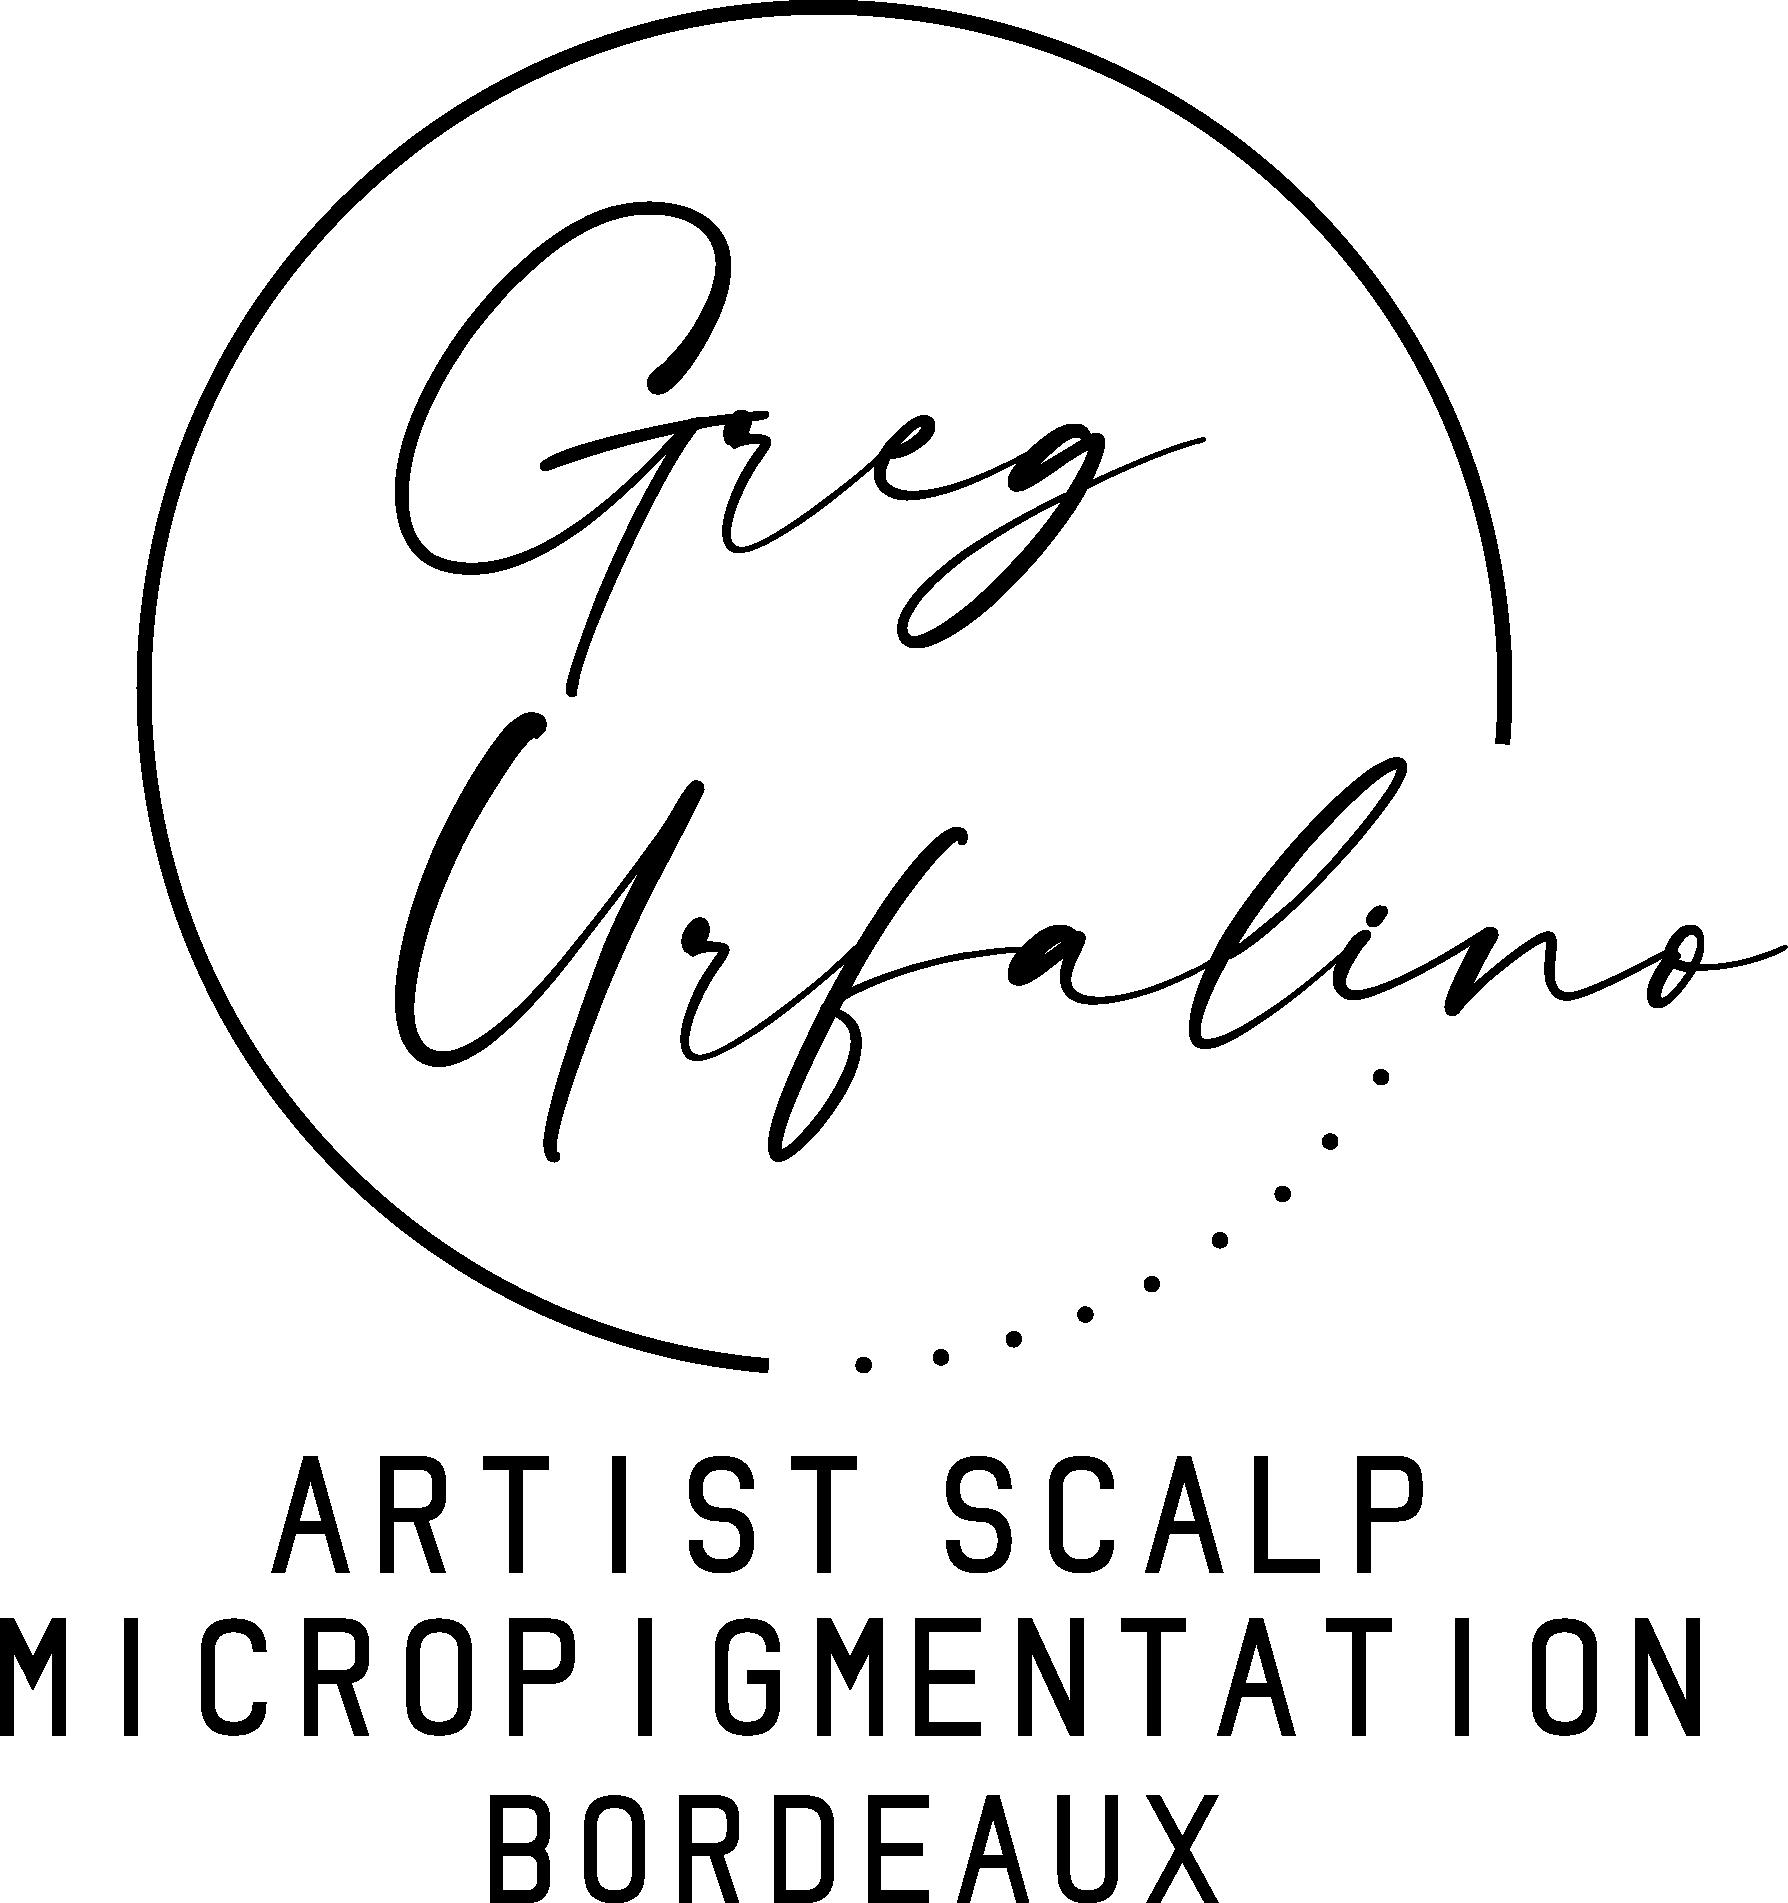 Greg Urfalino artist smp bordeaux #tricopigmentation #tricopigmentationbordeaux #smpbordeaux #dermopigmentationcapillaire #artisttatoo #bordeaux #tricopigmentationfrance #tatouagecuirchevelu #smp #pigmentbioresorbable #greffecapillaire